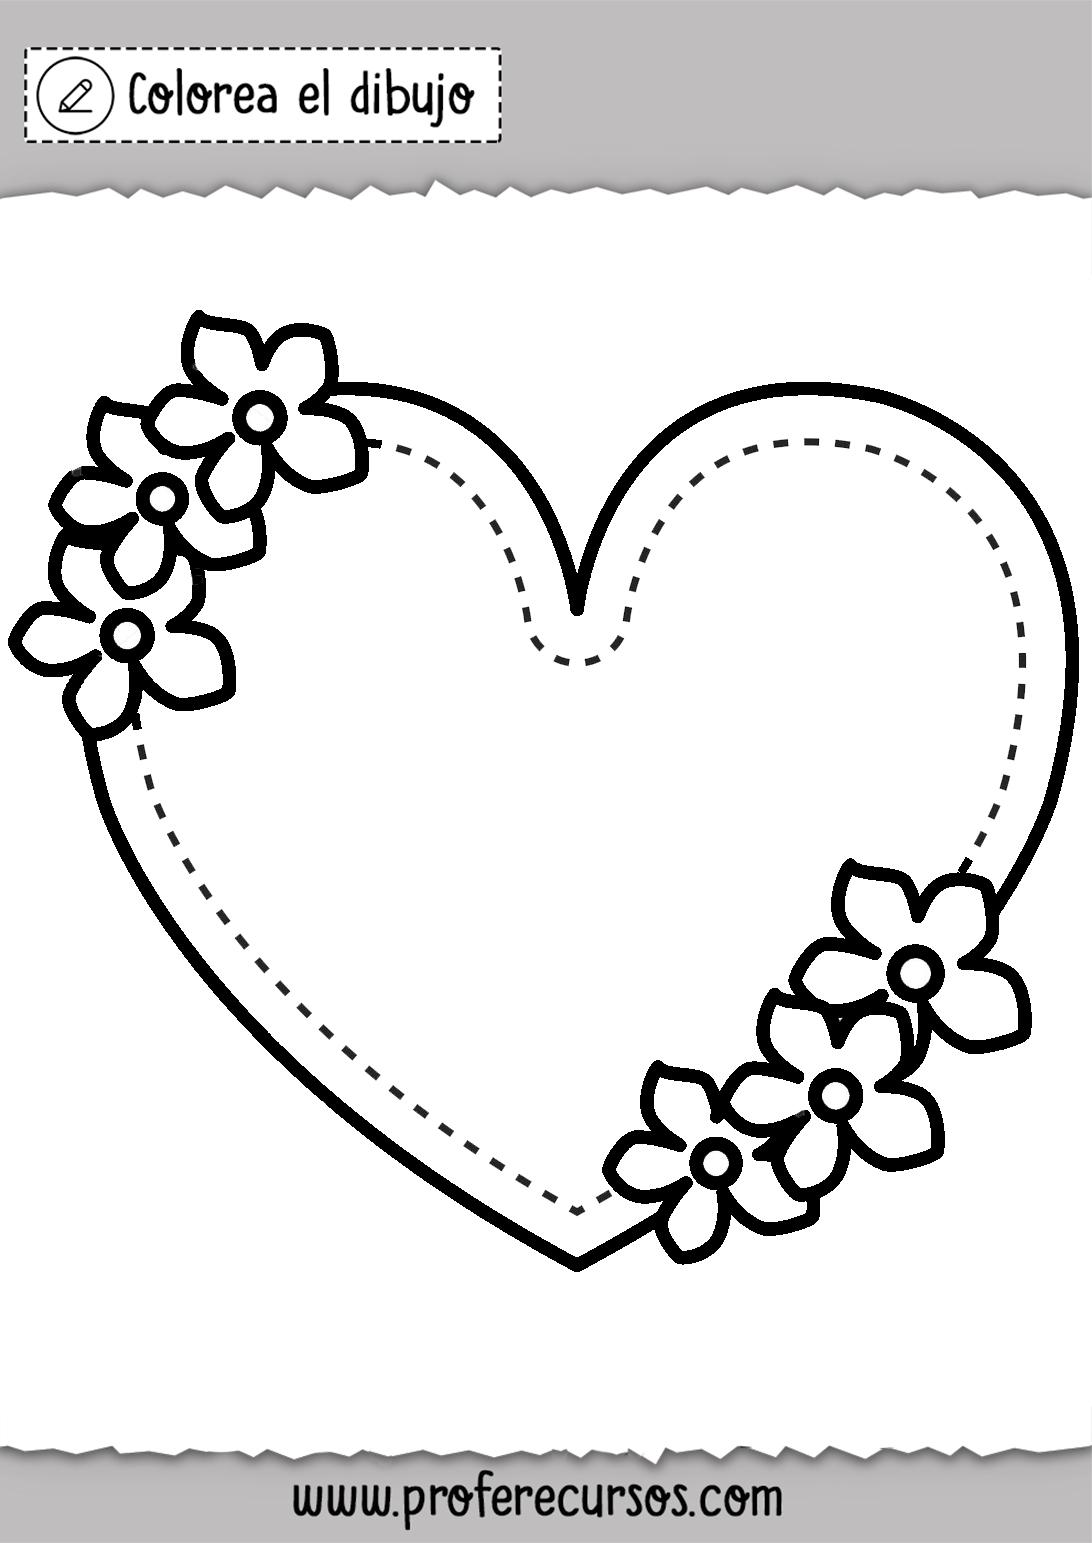 Dibujo Corazon para Colorear